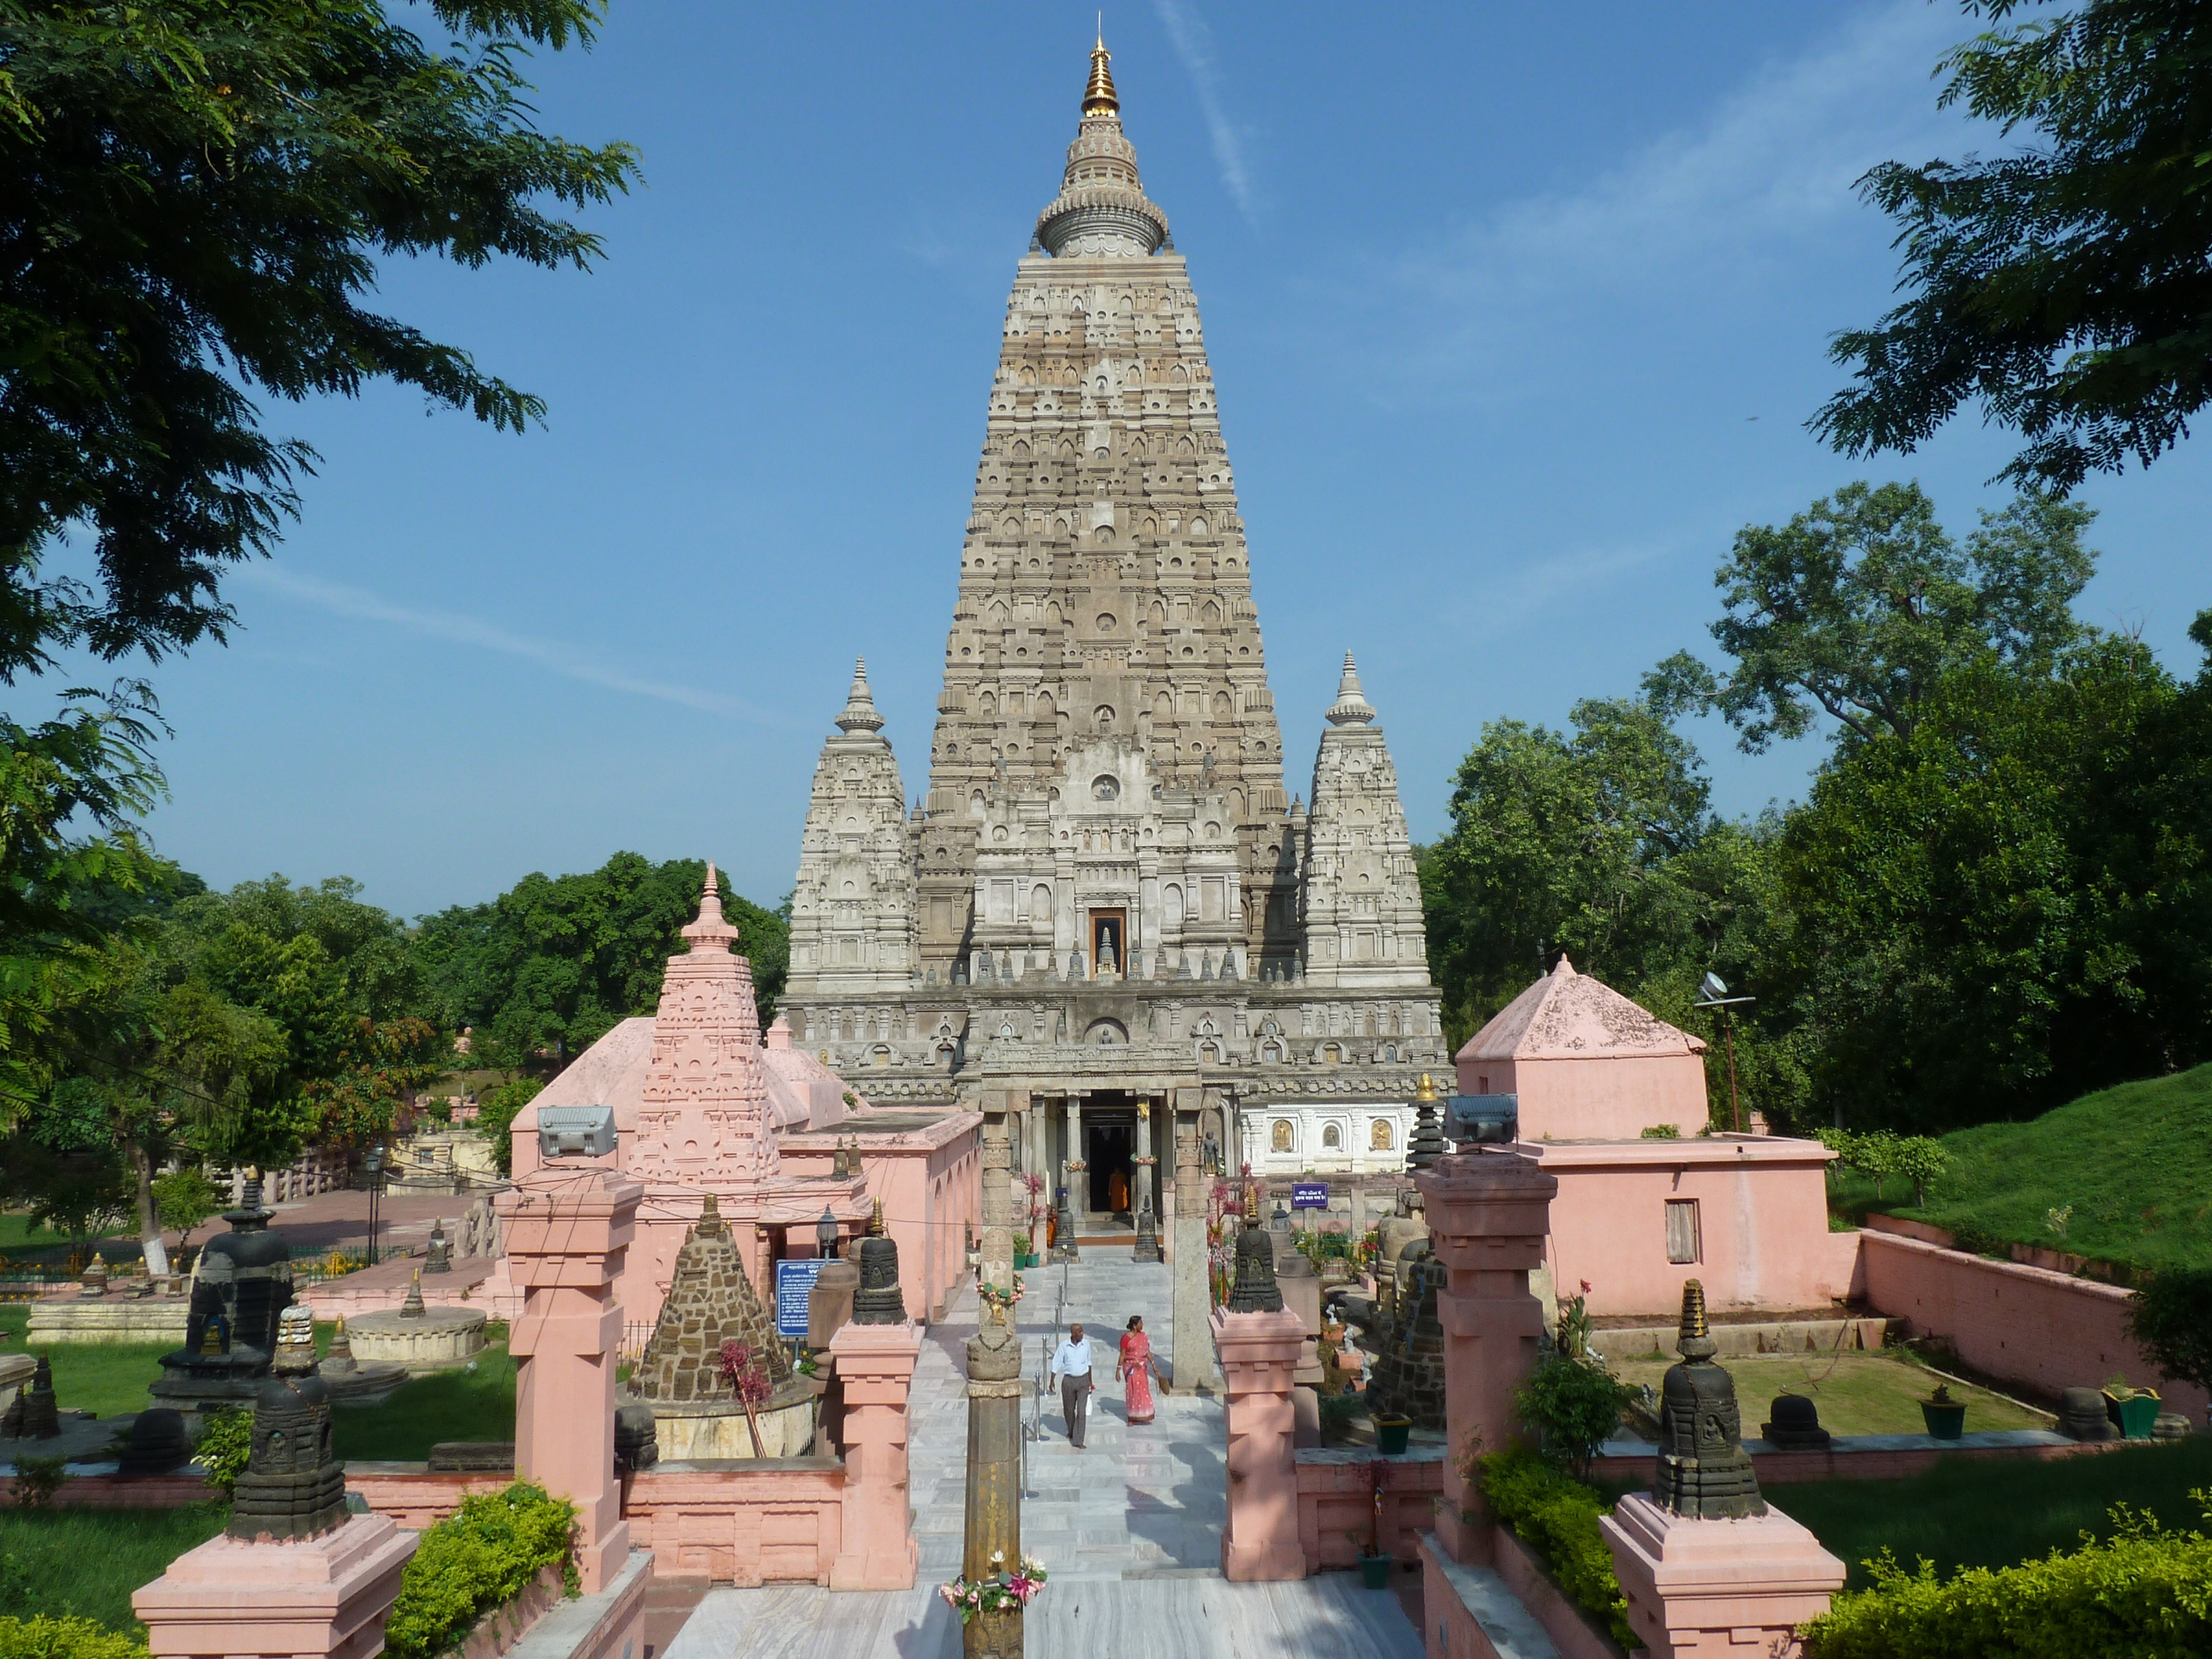 3. Templo Mahabodhi